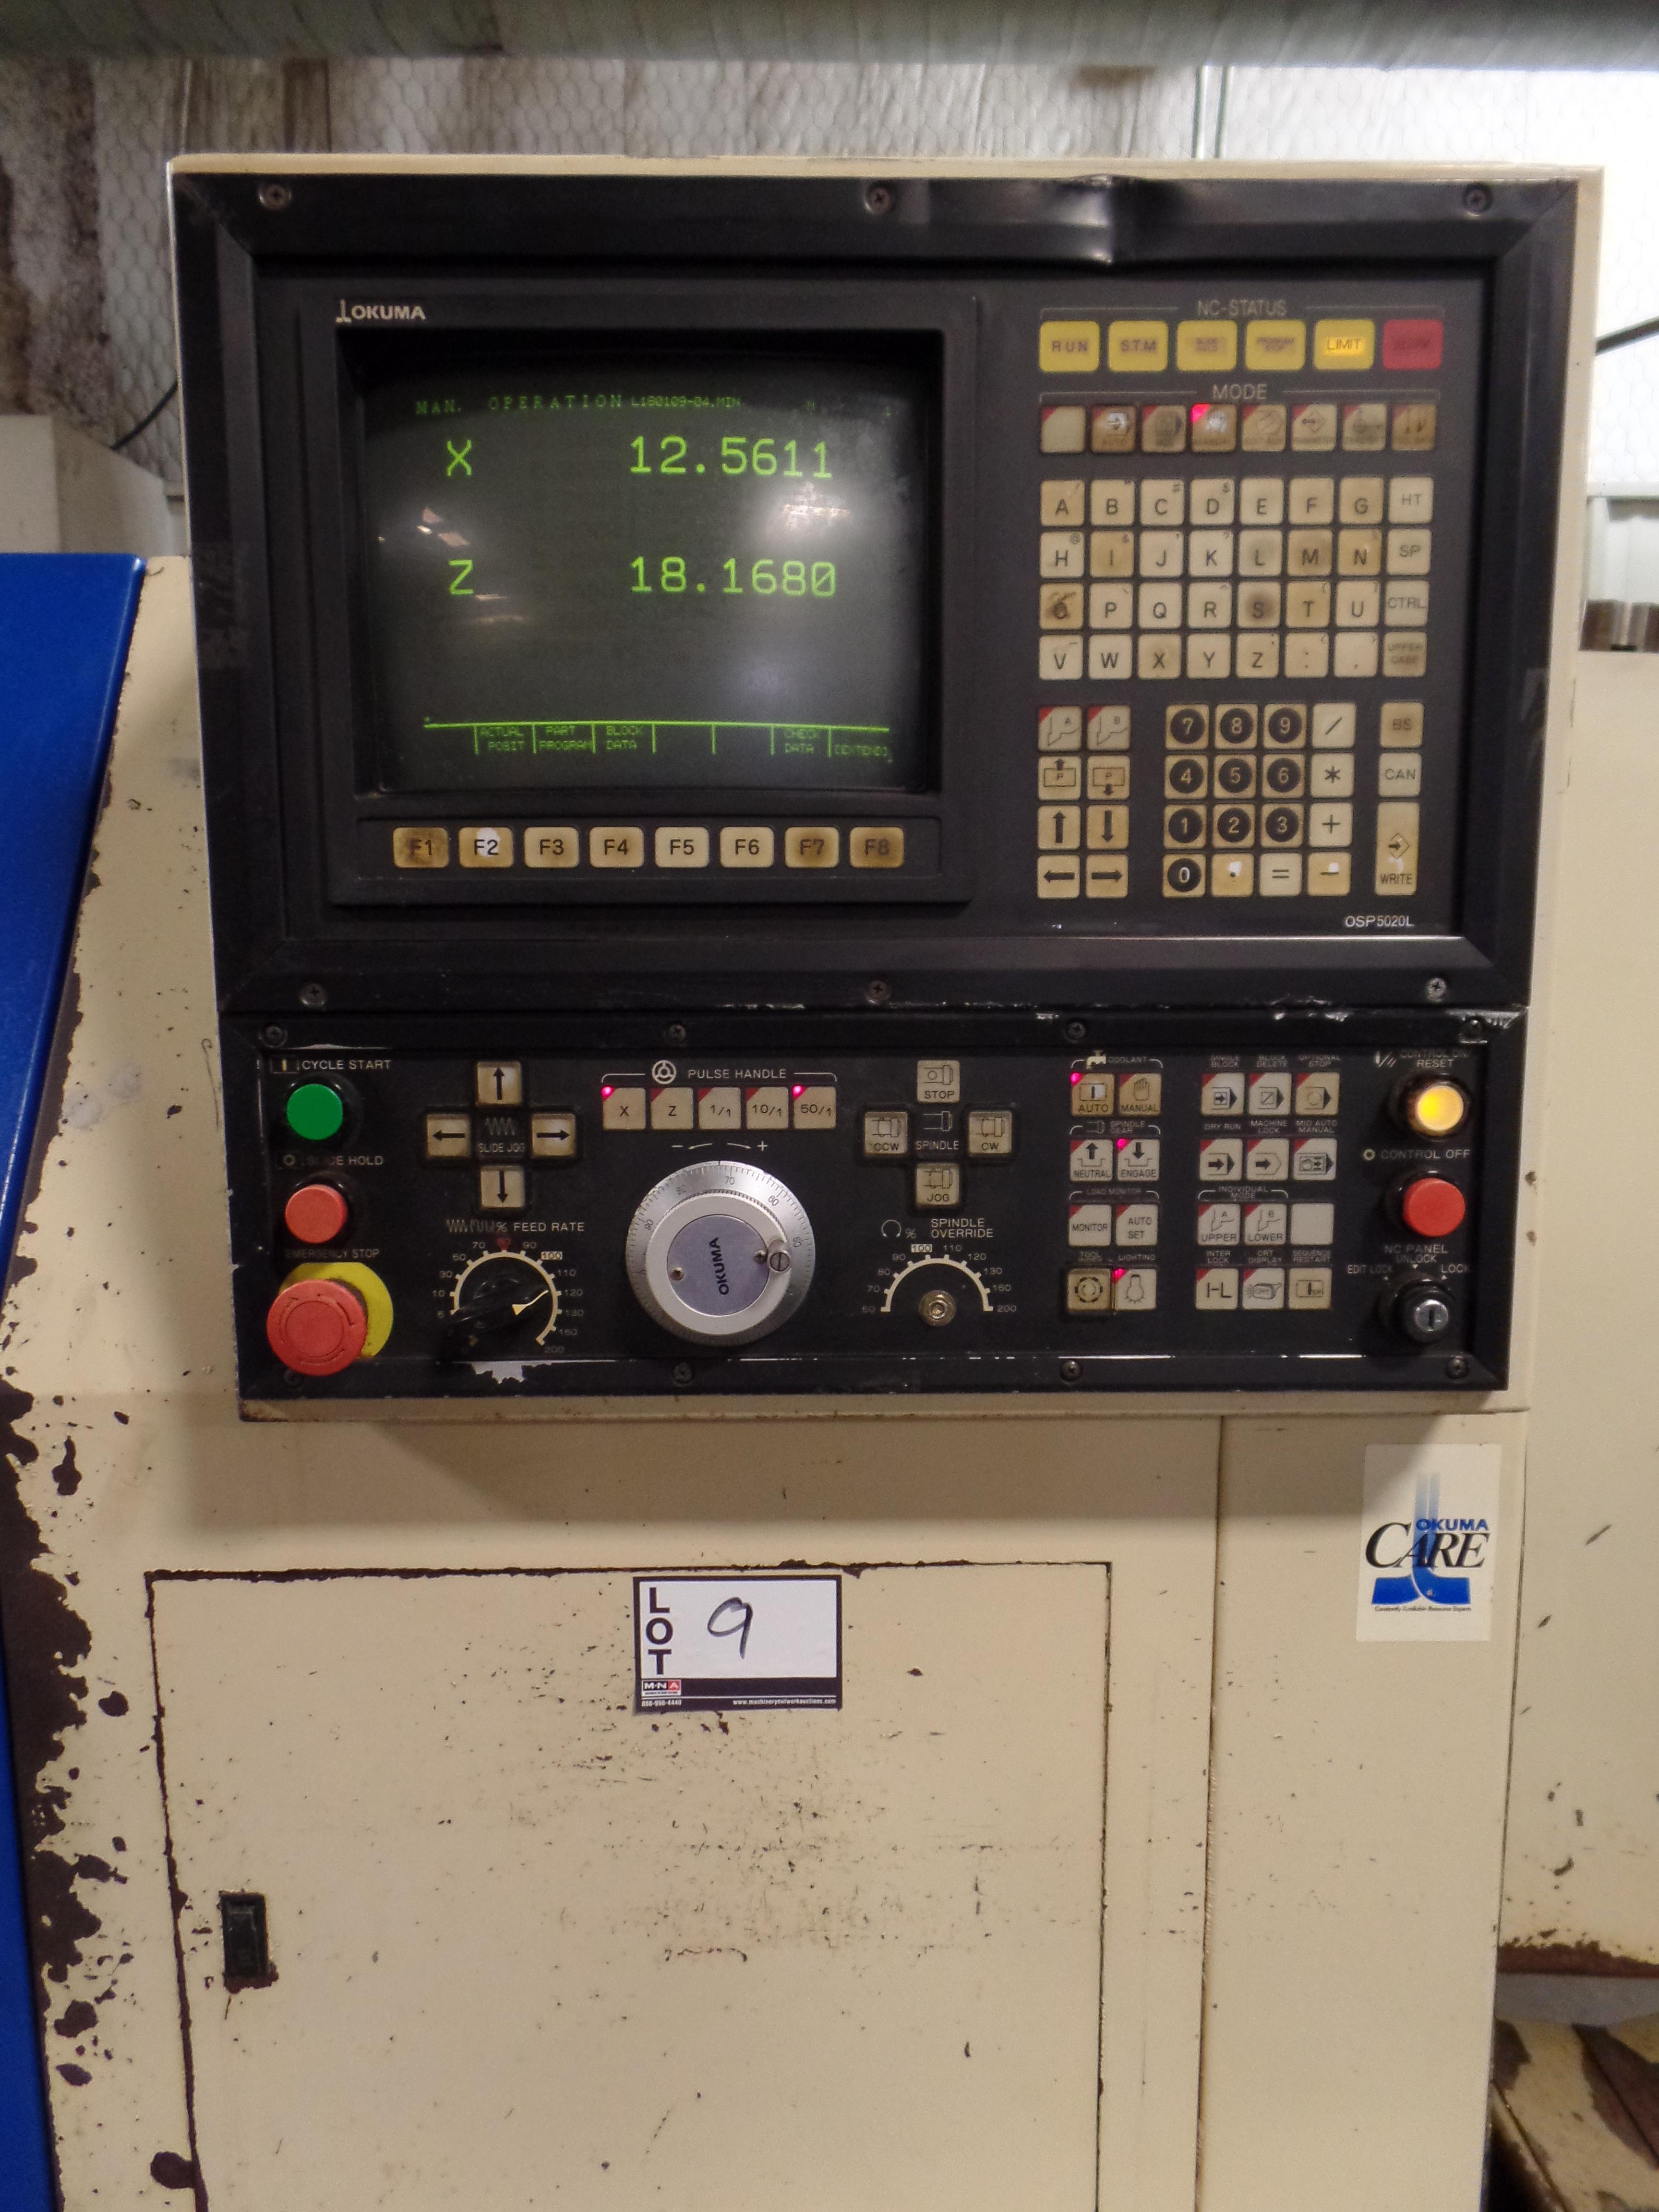 "1996 Okuma Cadet L1420 2-axis LNC 10 CNC turning center, 5020 control, chip conveyor, 12"" chuck - Image 3 of 6"